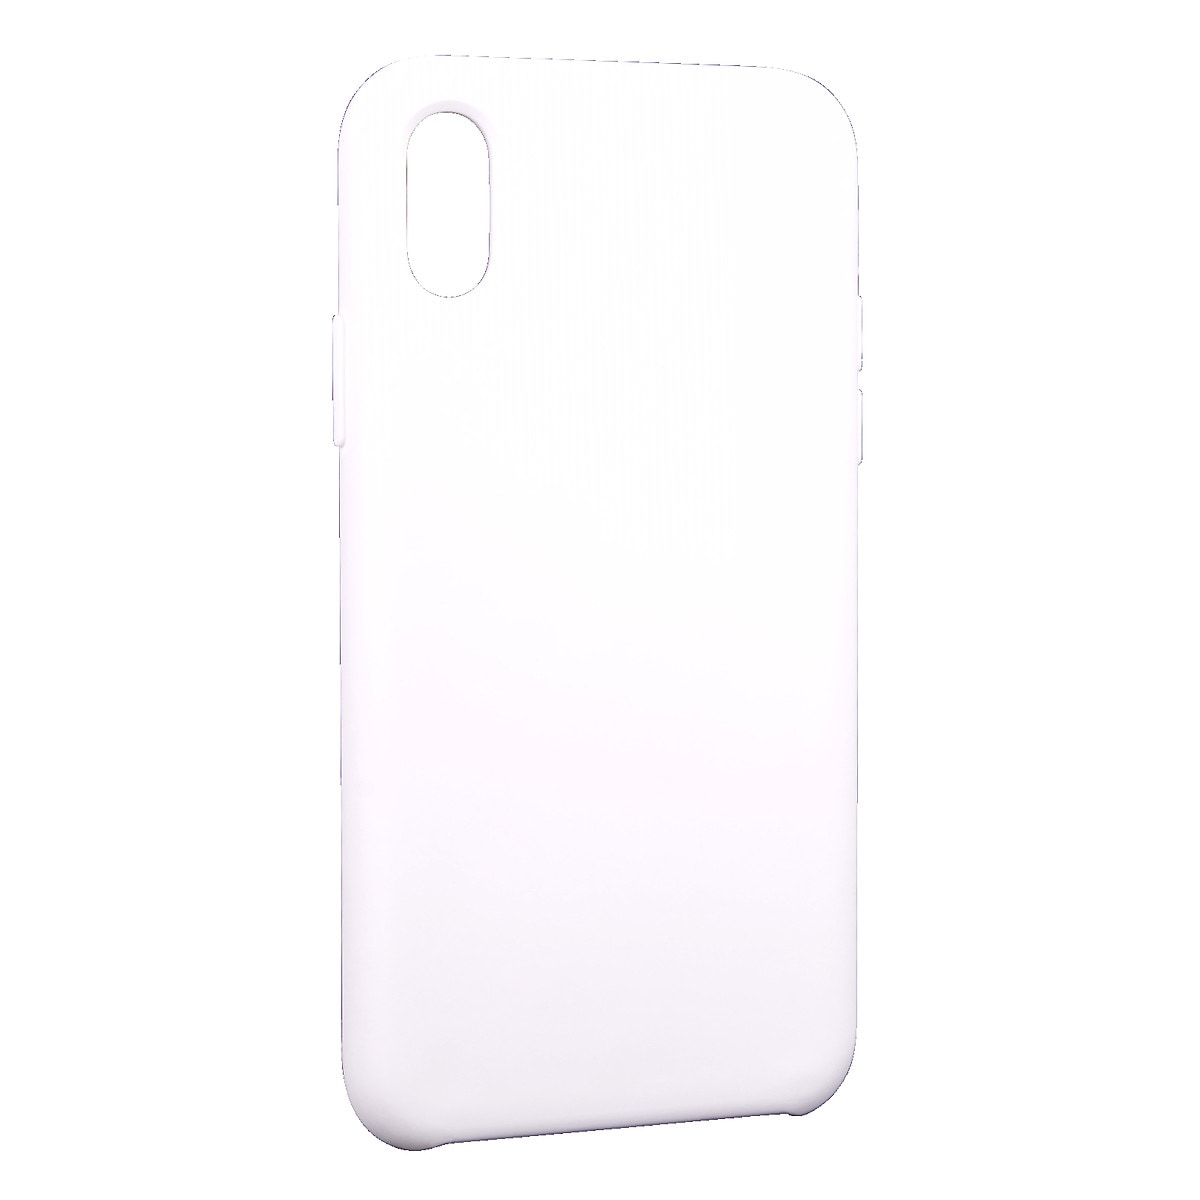 Mobildeksel til iPhone X/XS